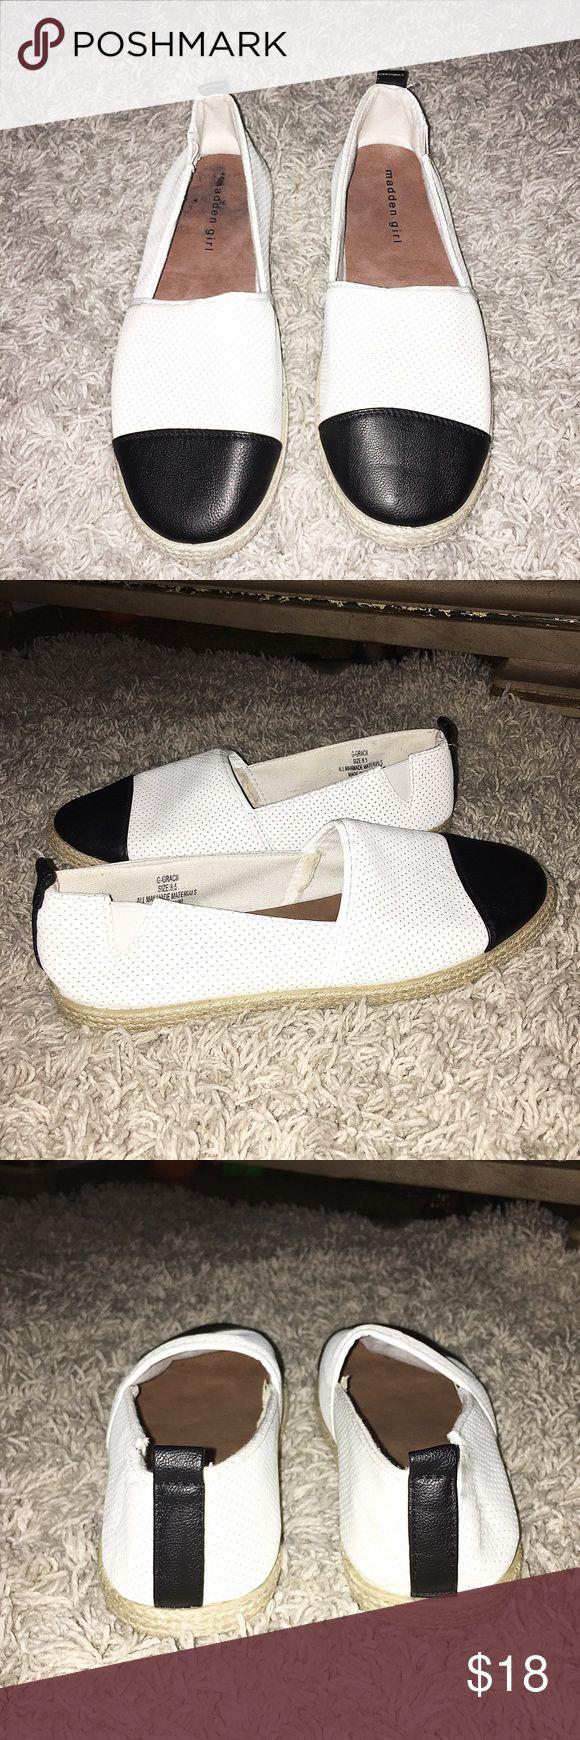 Madden Girl White&Black Espadrilles Size 8.5. White / black. Man made material. 1/2 inch heel. Madden Girl Shoes Espadrilles